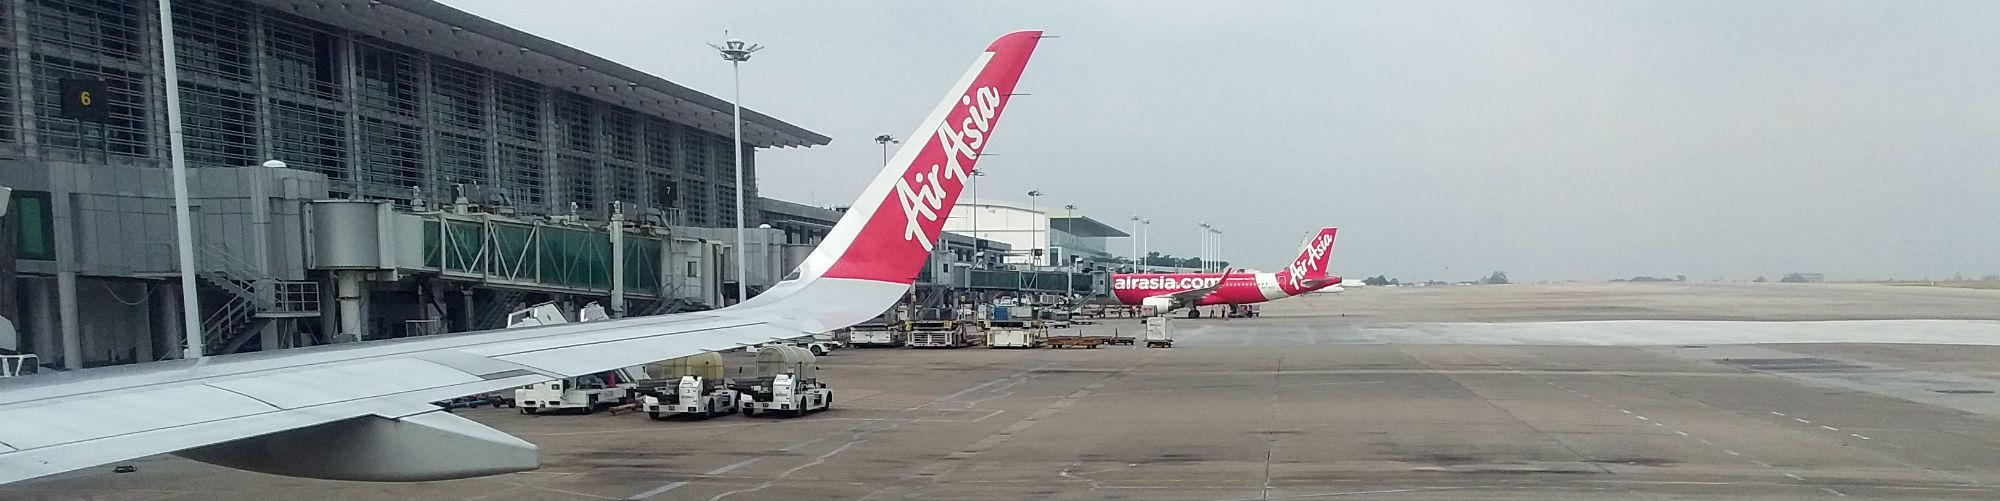 Yangon International Airport, Yangon